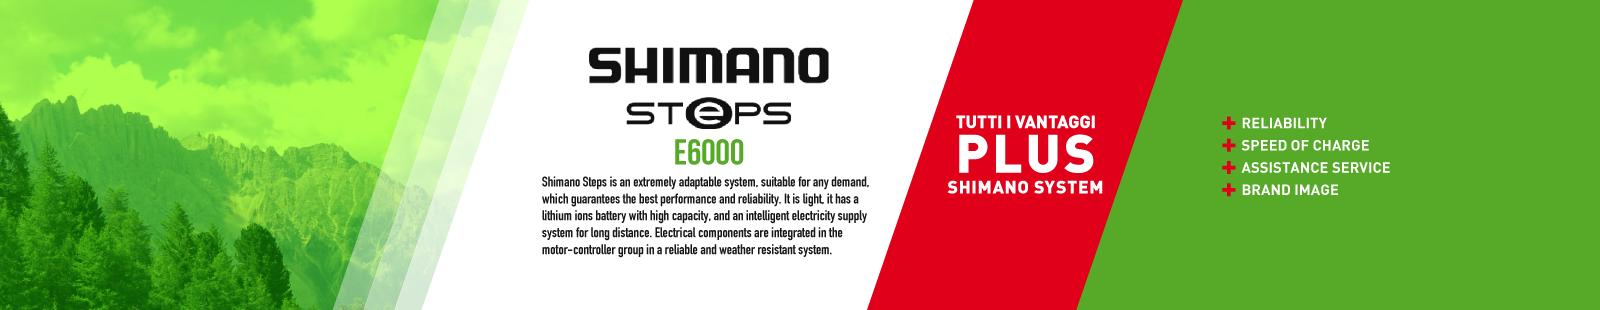 Shimano Steps E6000 | Be green